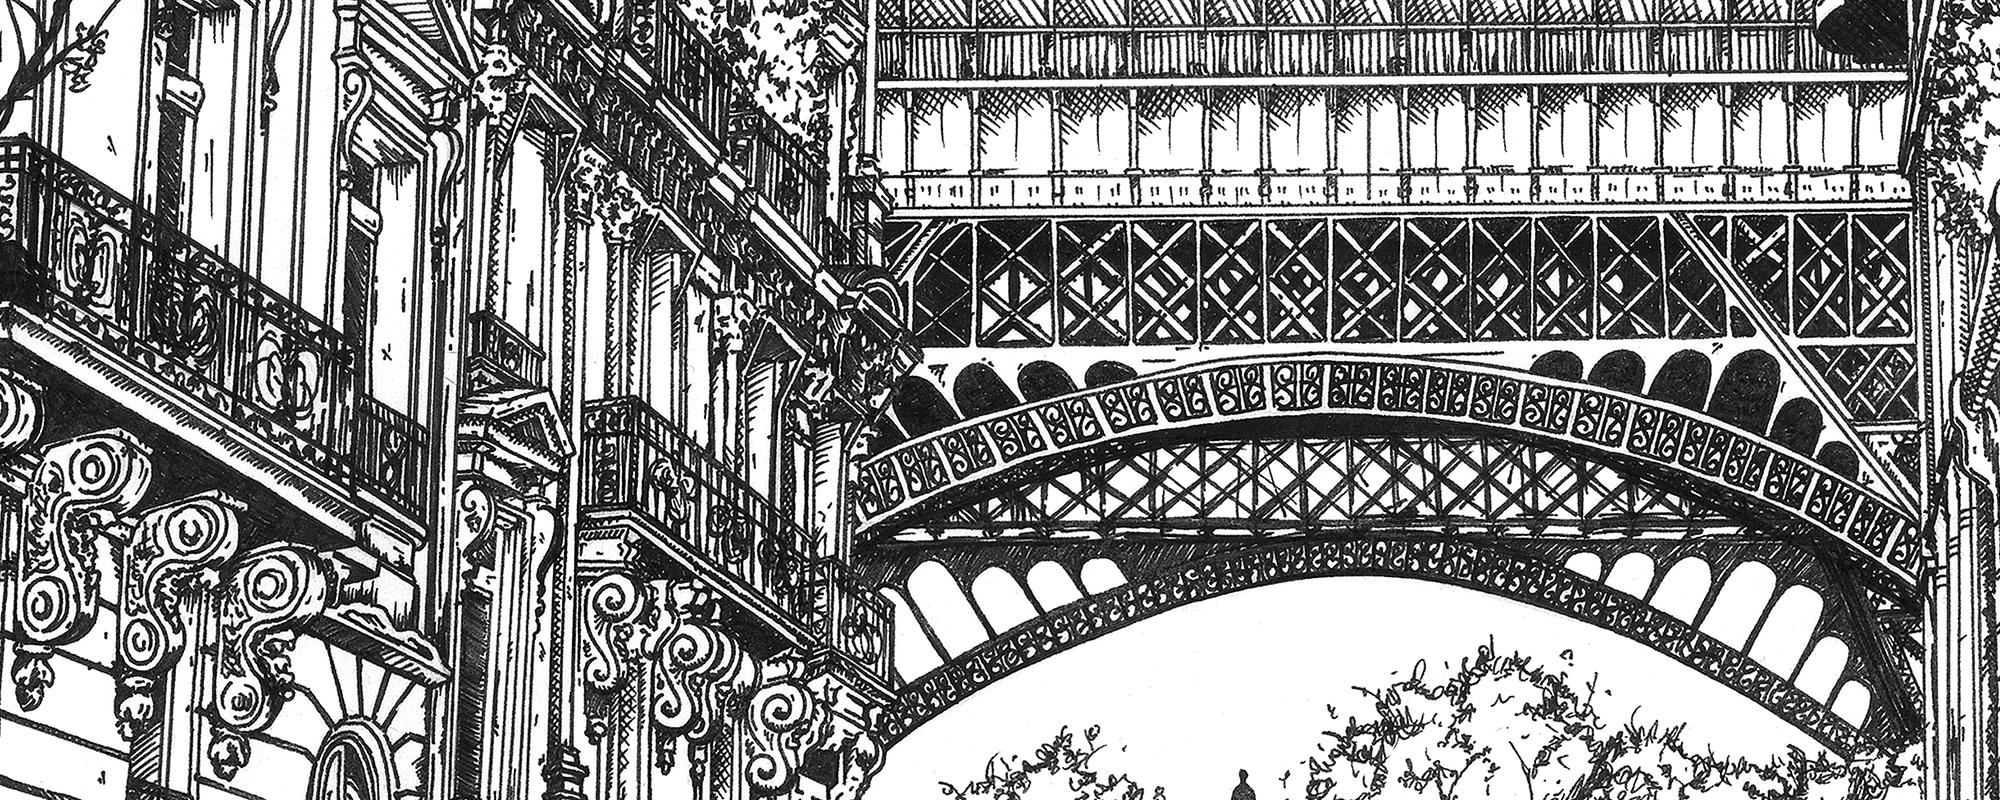 Line detail of Eiffel